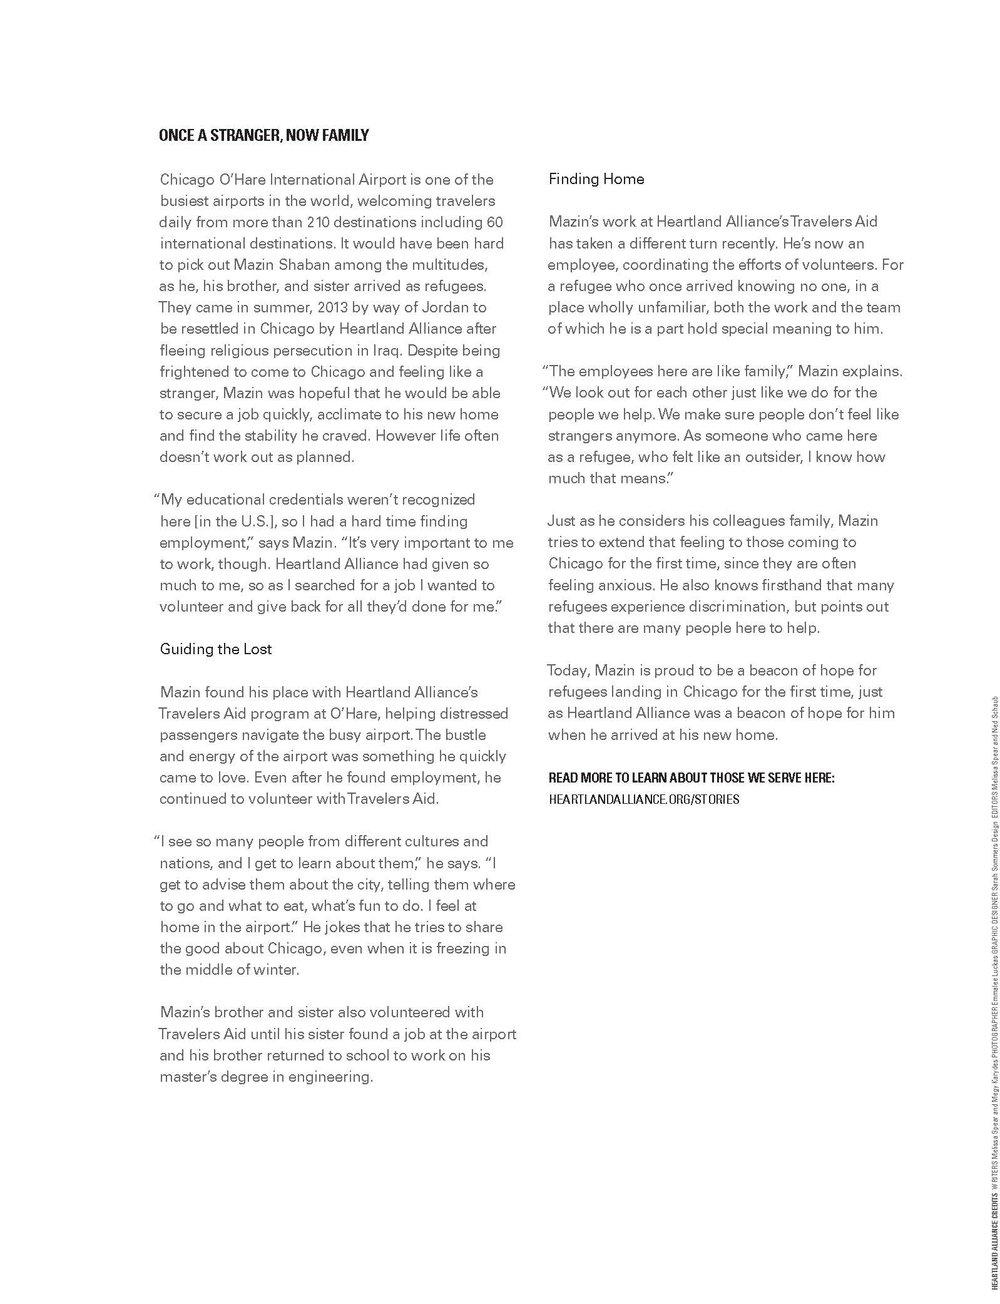 HA-Newsletter-April2016-GalleryVersion_Page_2.jpg